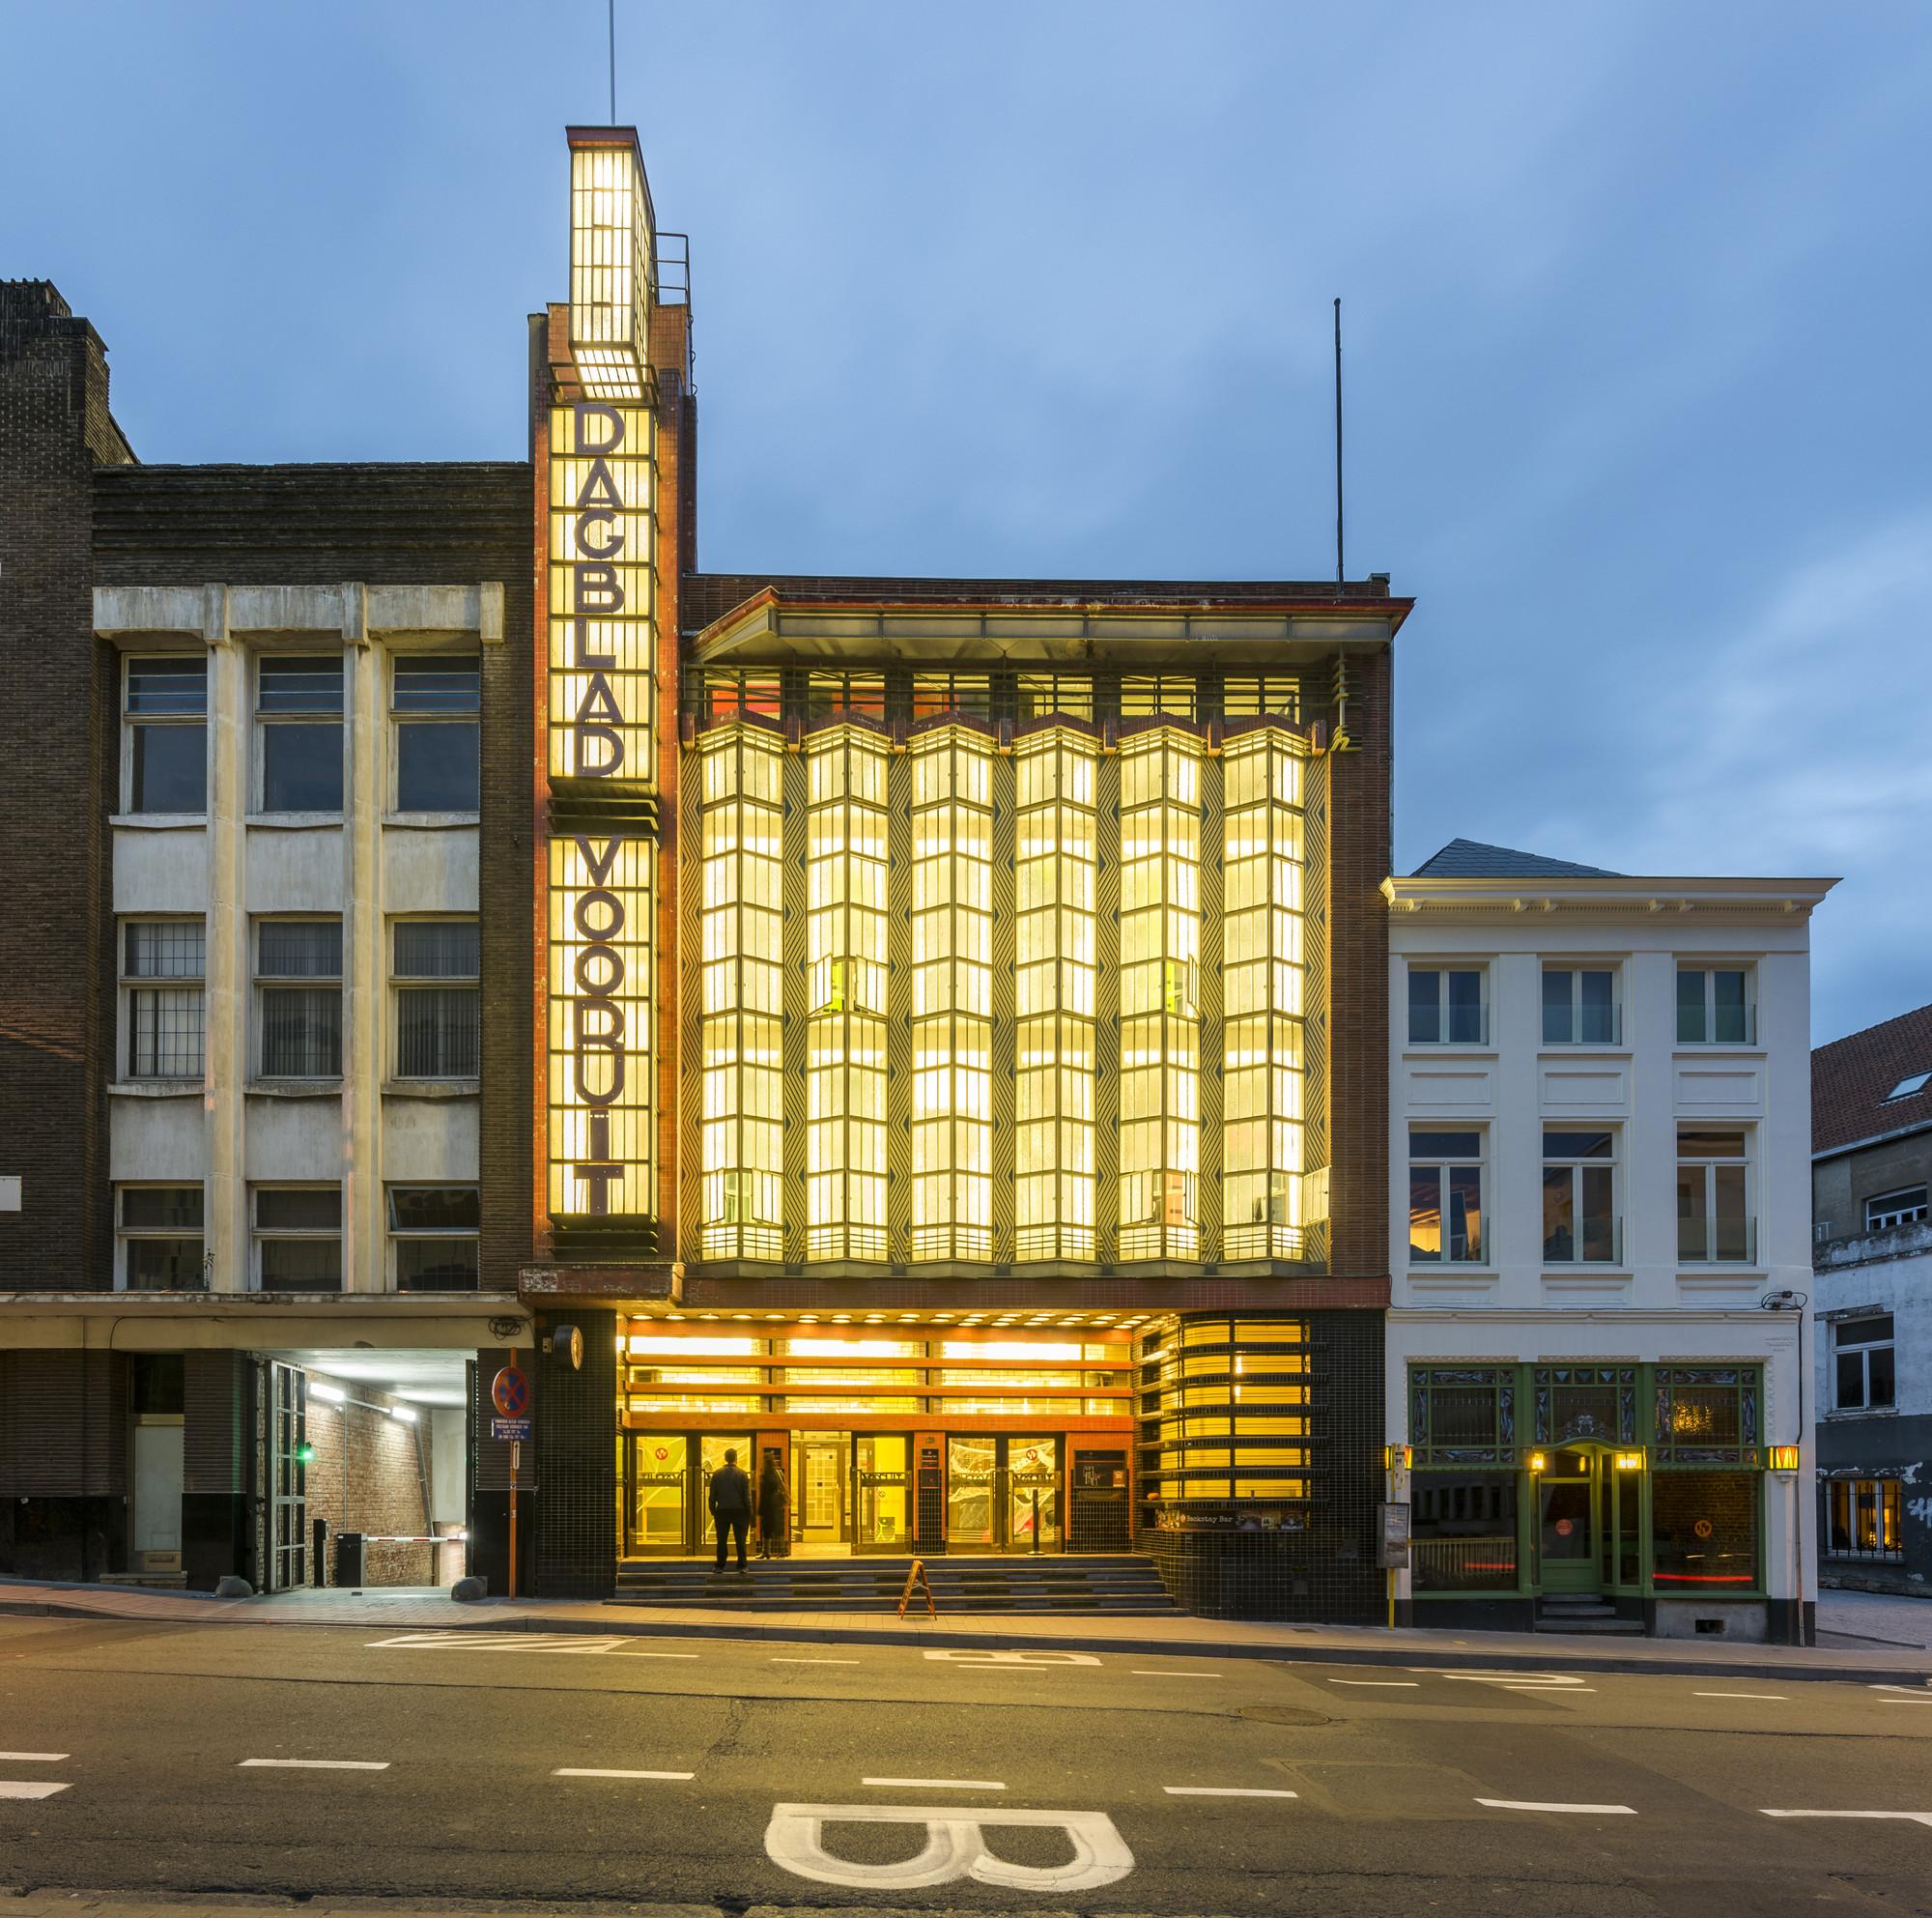 Backstay Hostel Ghent / A154 + Nele Van Damme + Yannick Baeyens, © Luc Roymans Photography